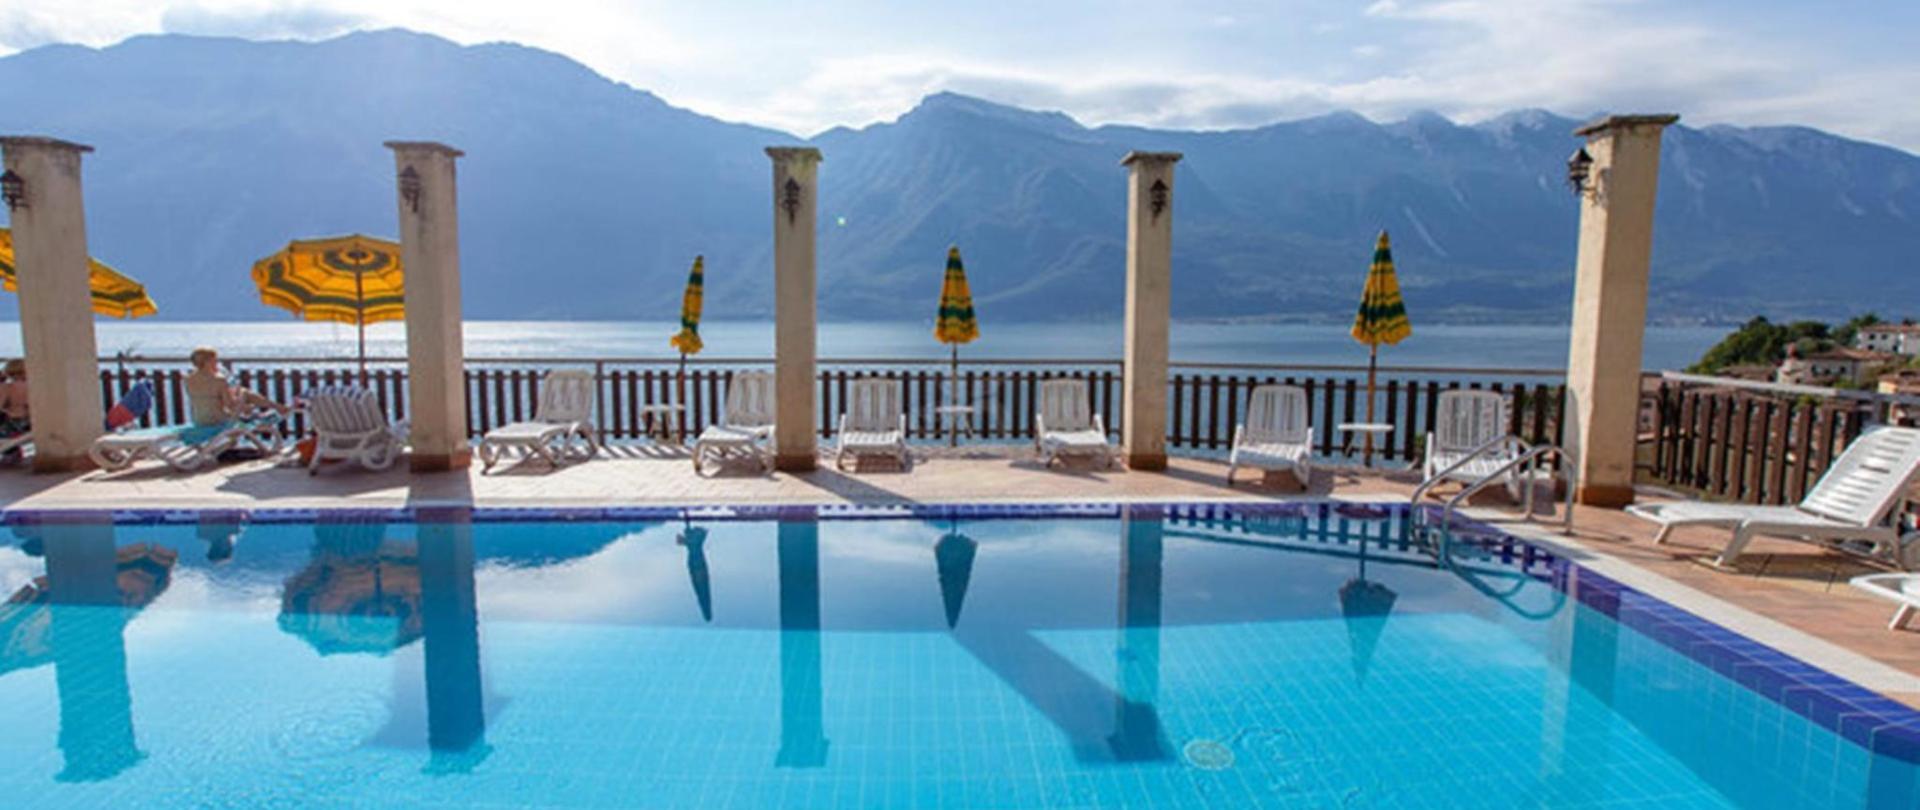 Outdoor swimming pool 4.jpg